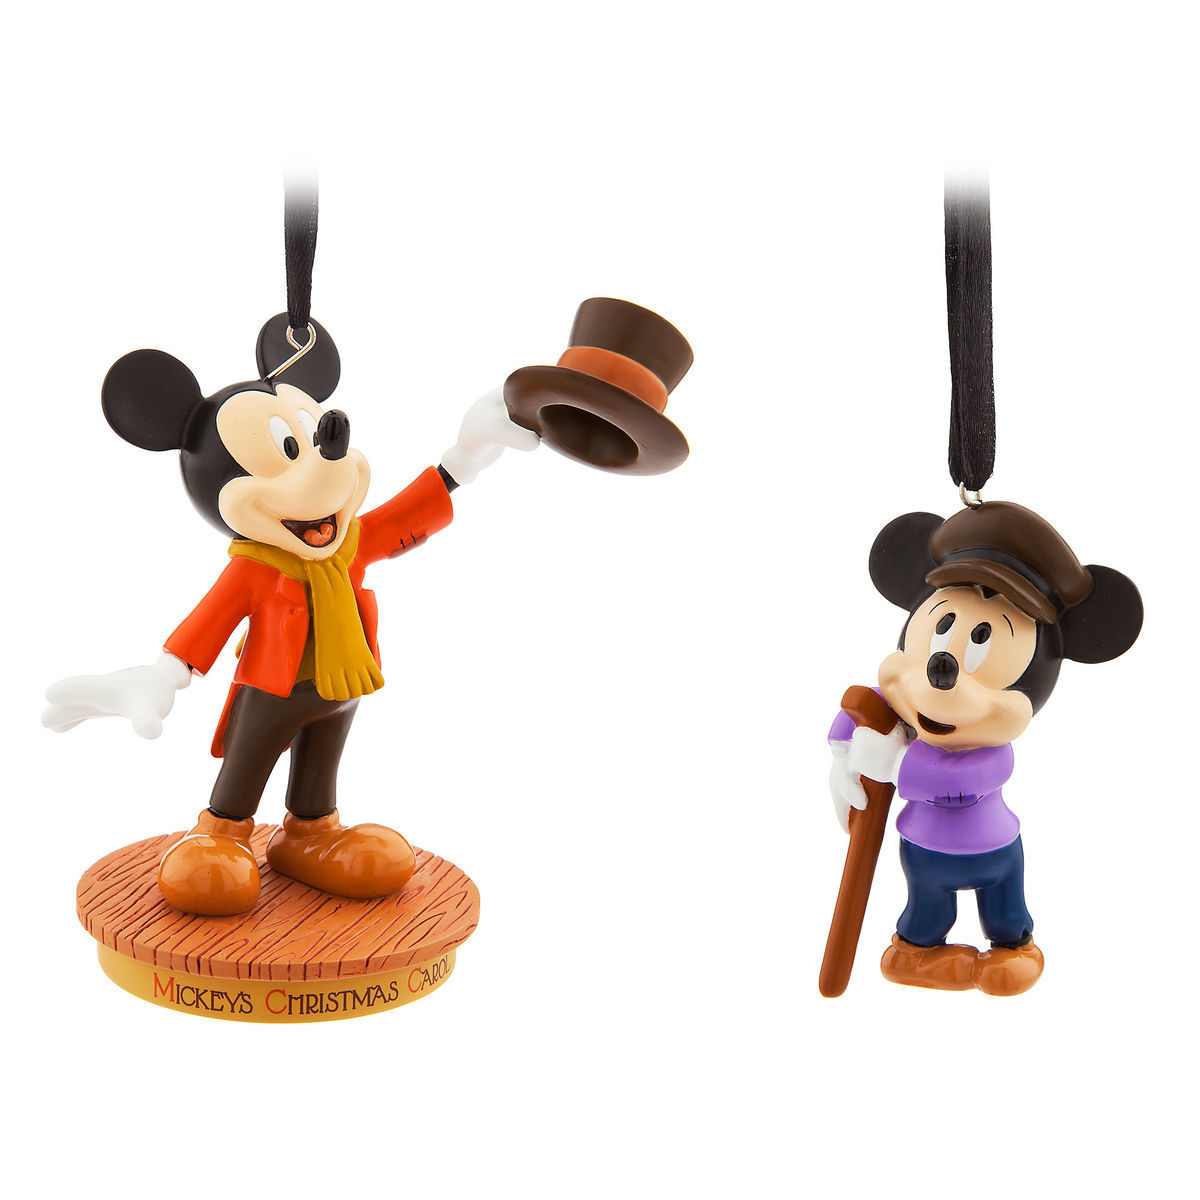 Disney Christmas Carol.Disney Ornament Set Mickey Mouse Memories Mickey S Christmas Carol